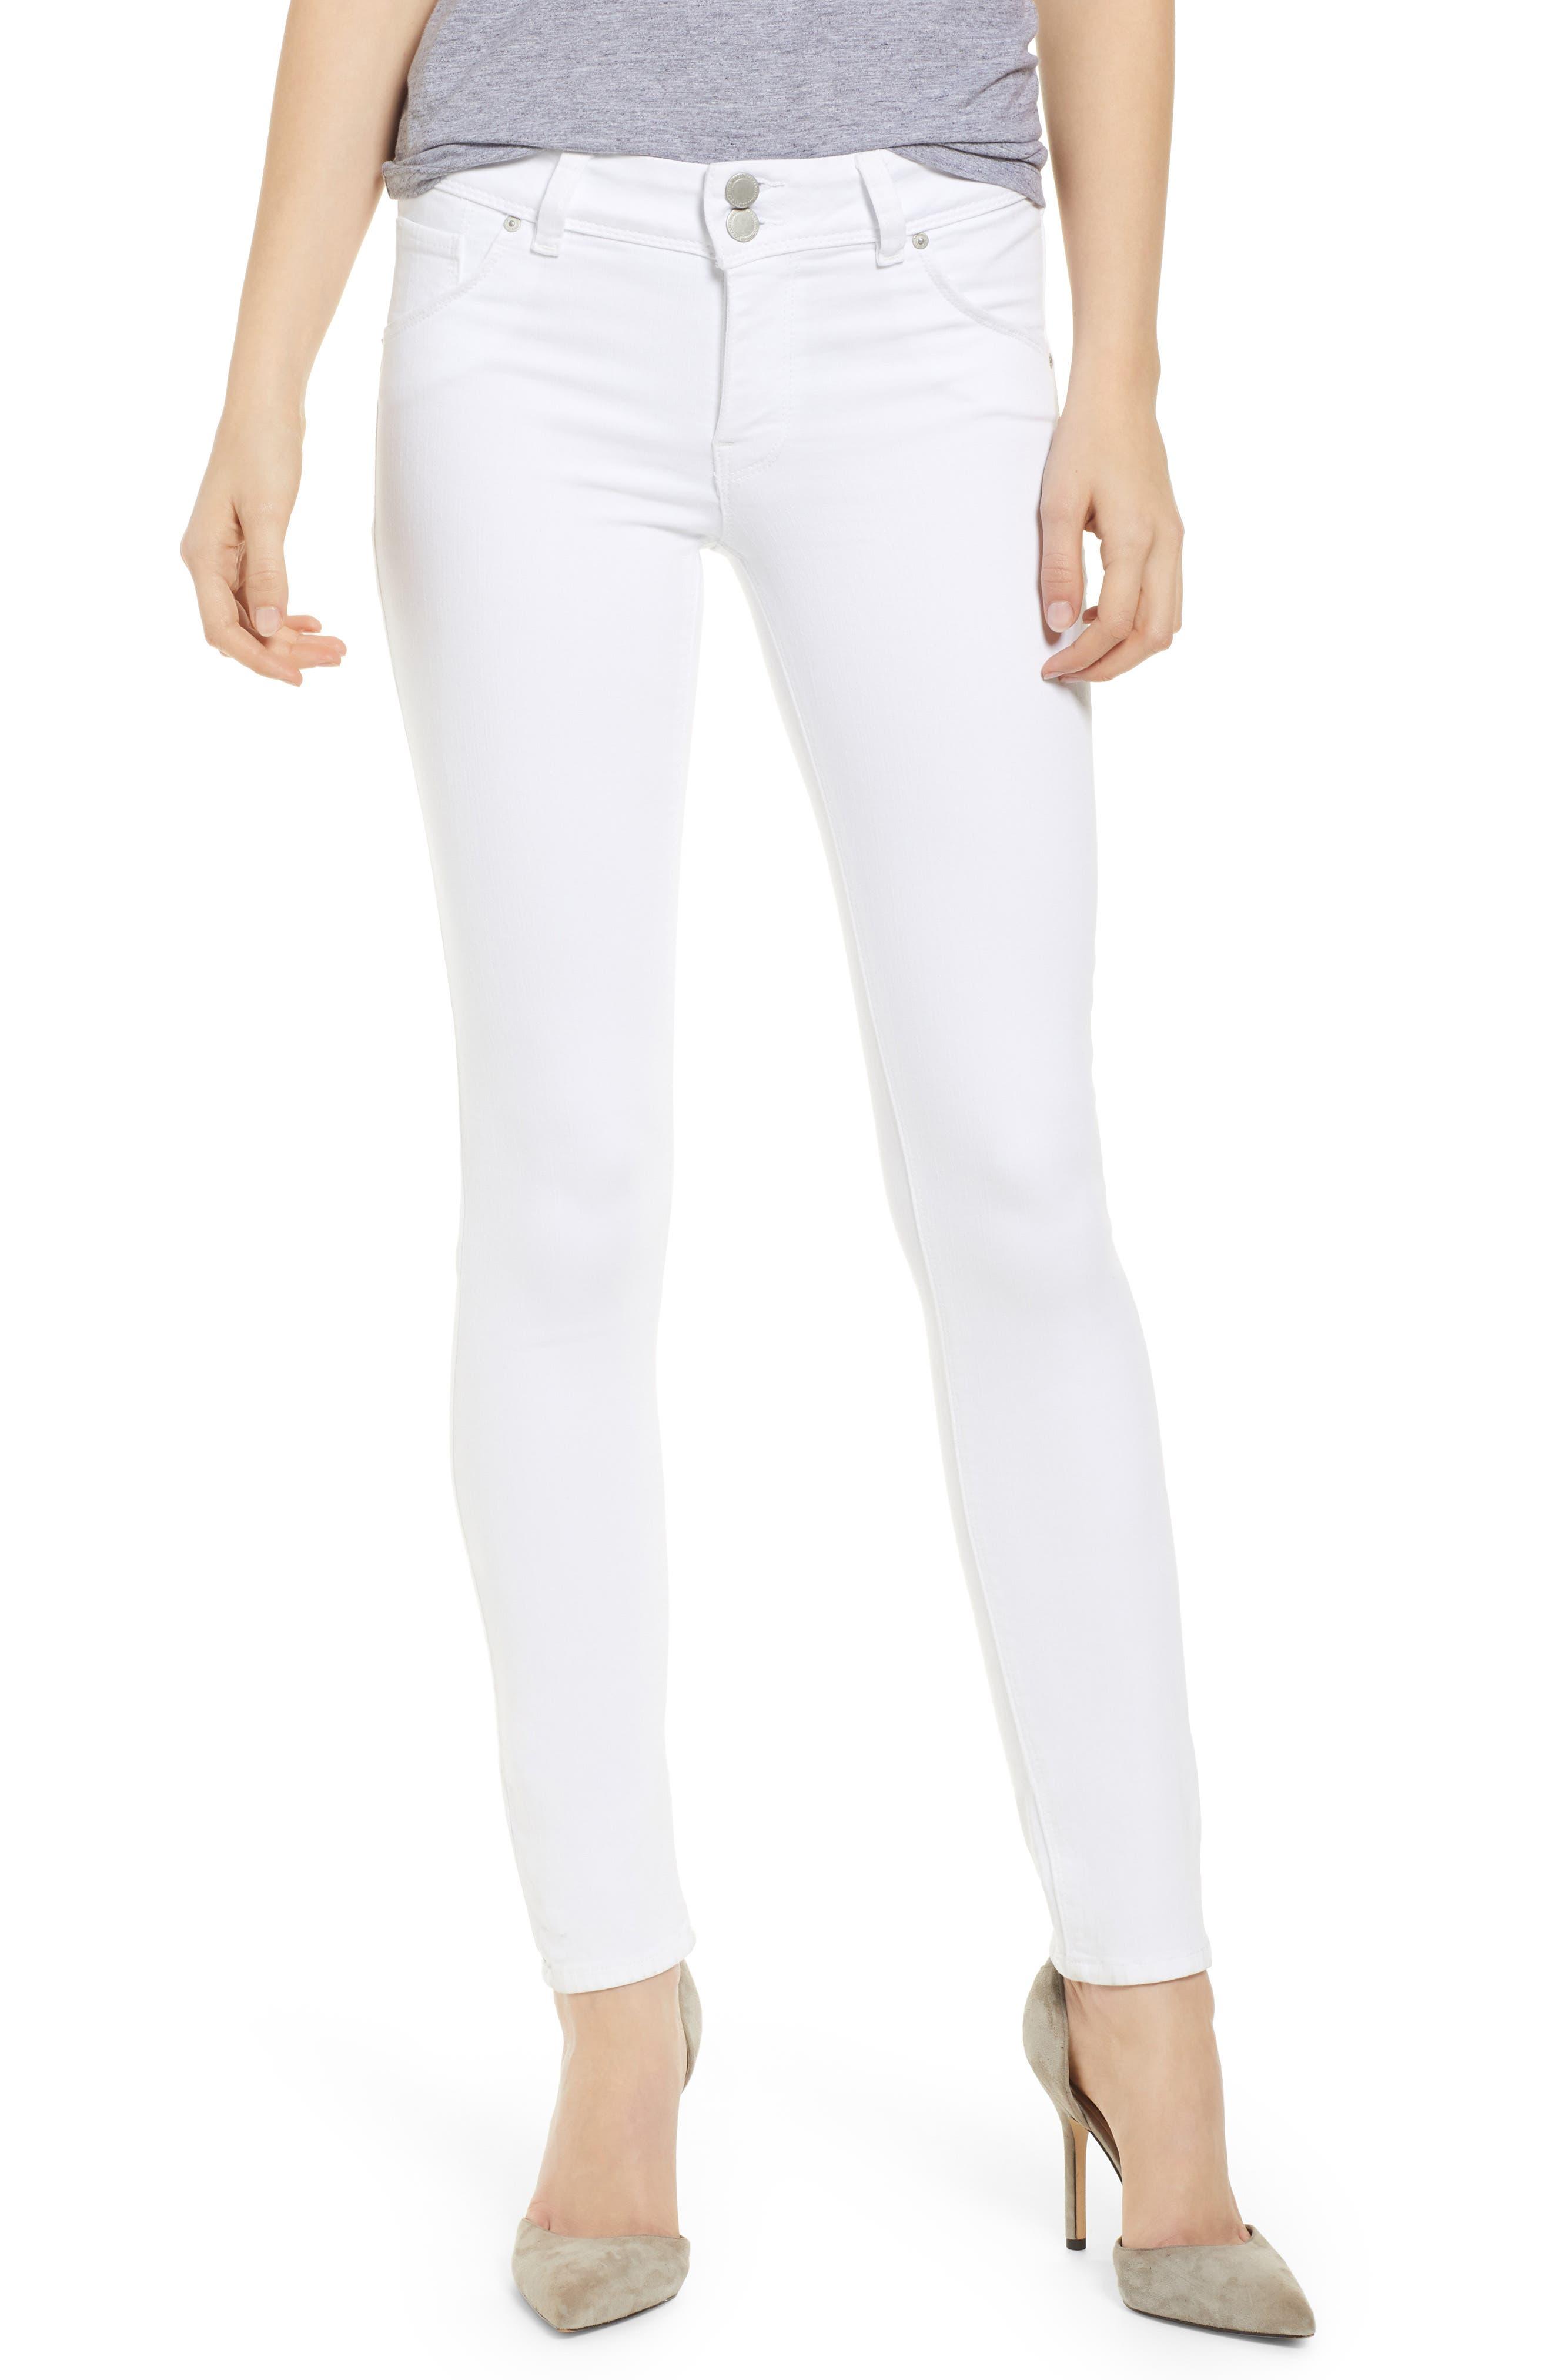 HUDSON JEANS,                             Collin Skinny Jeans,                             Main thumbnail 1, color,                             WHITE